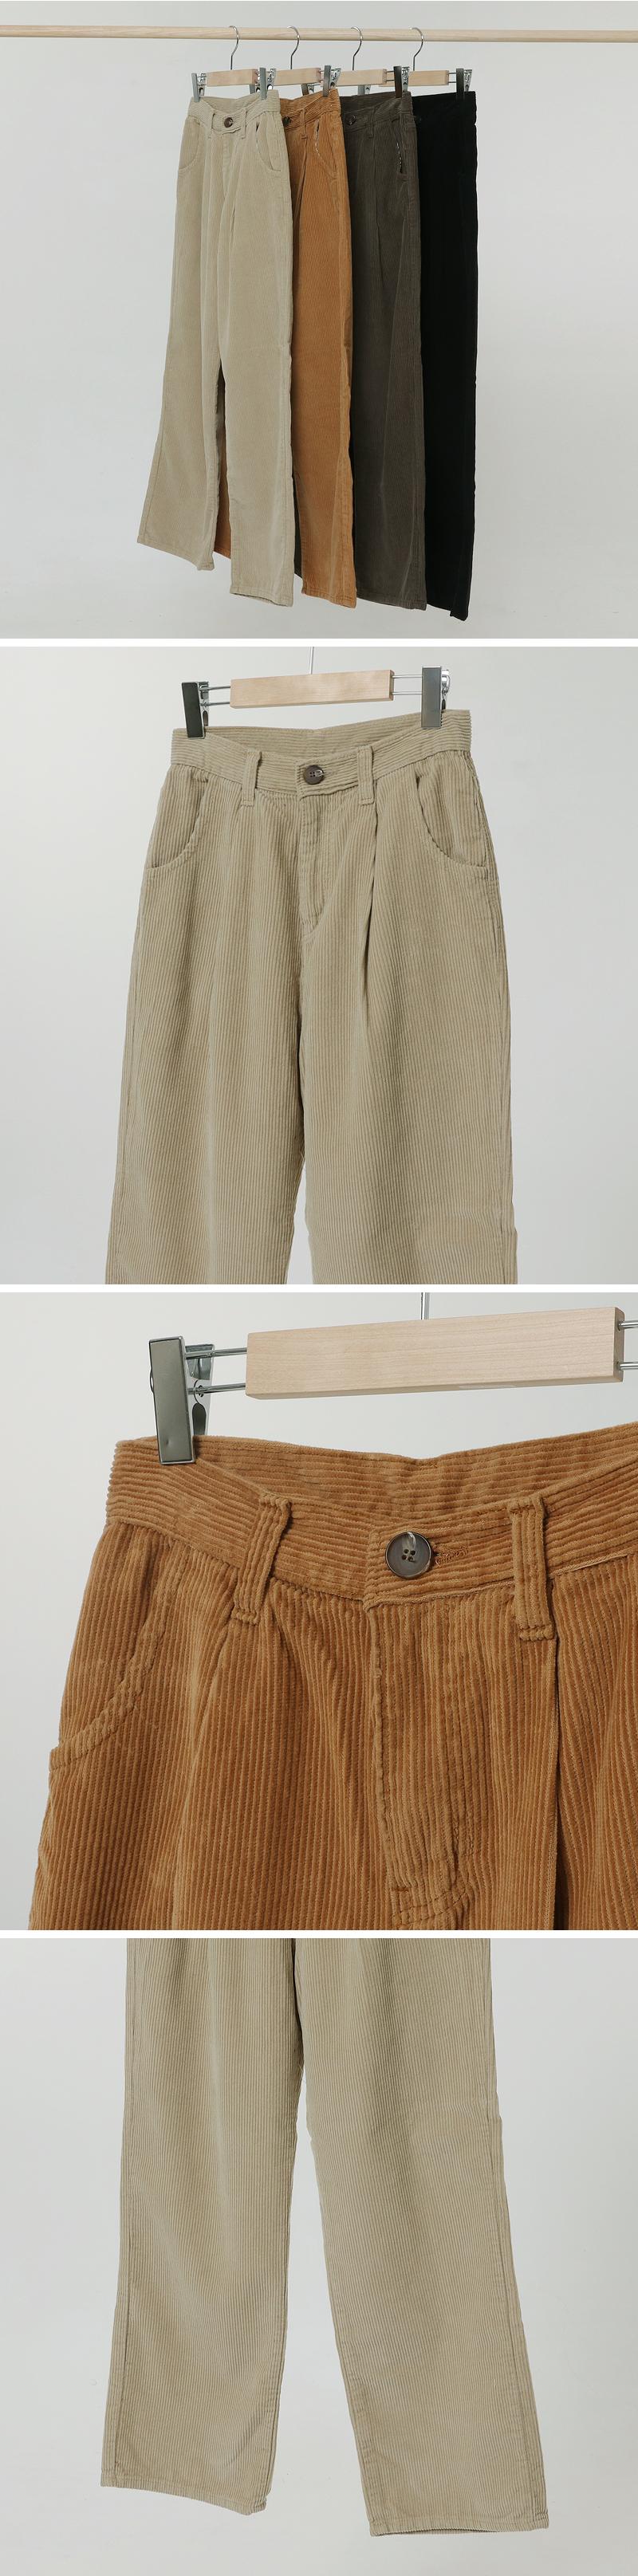 Mandy corduroy pintuck wide pants